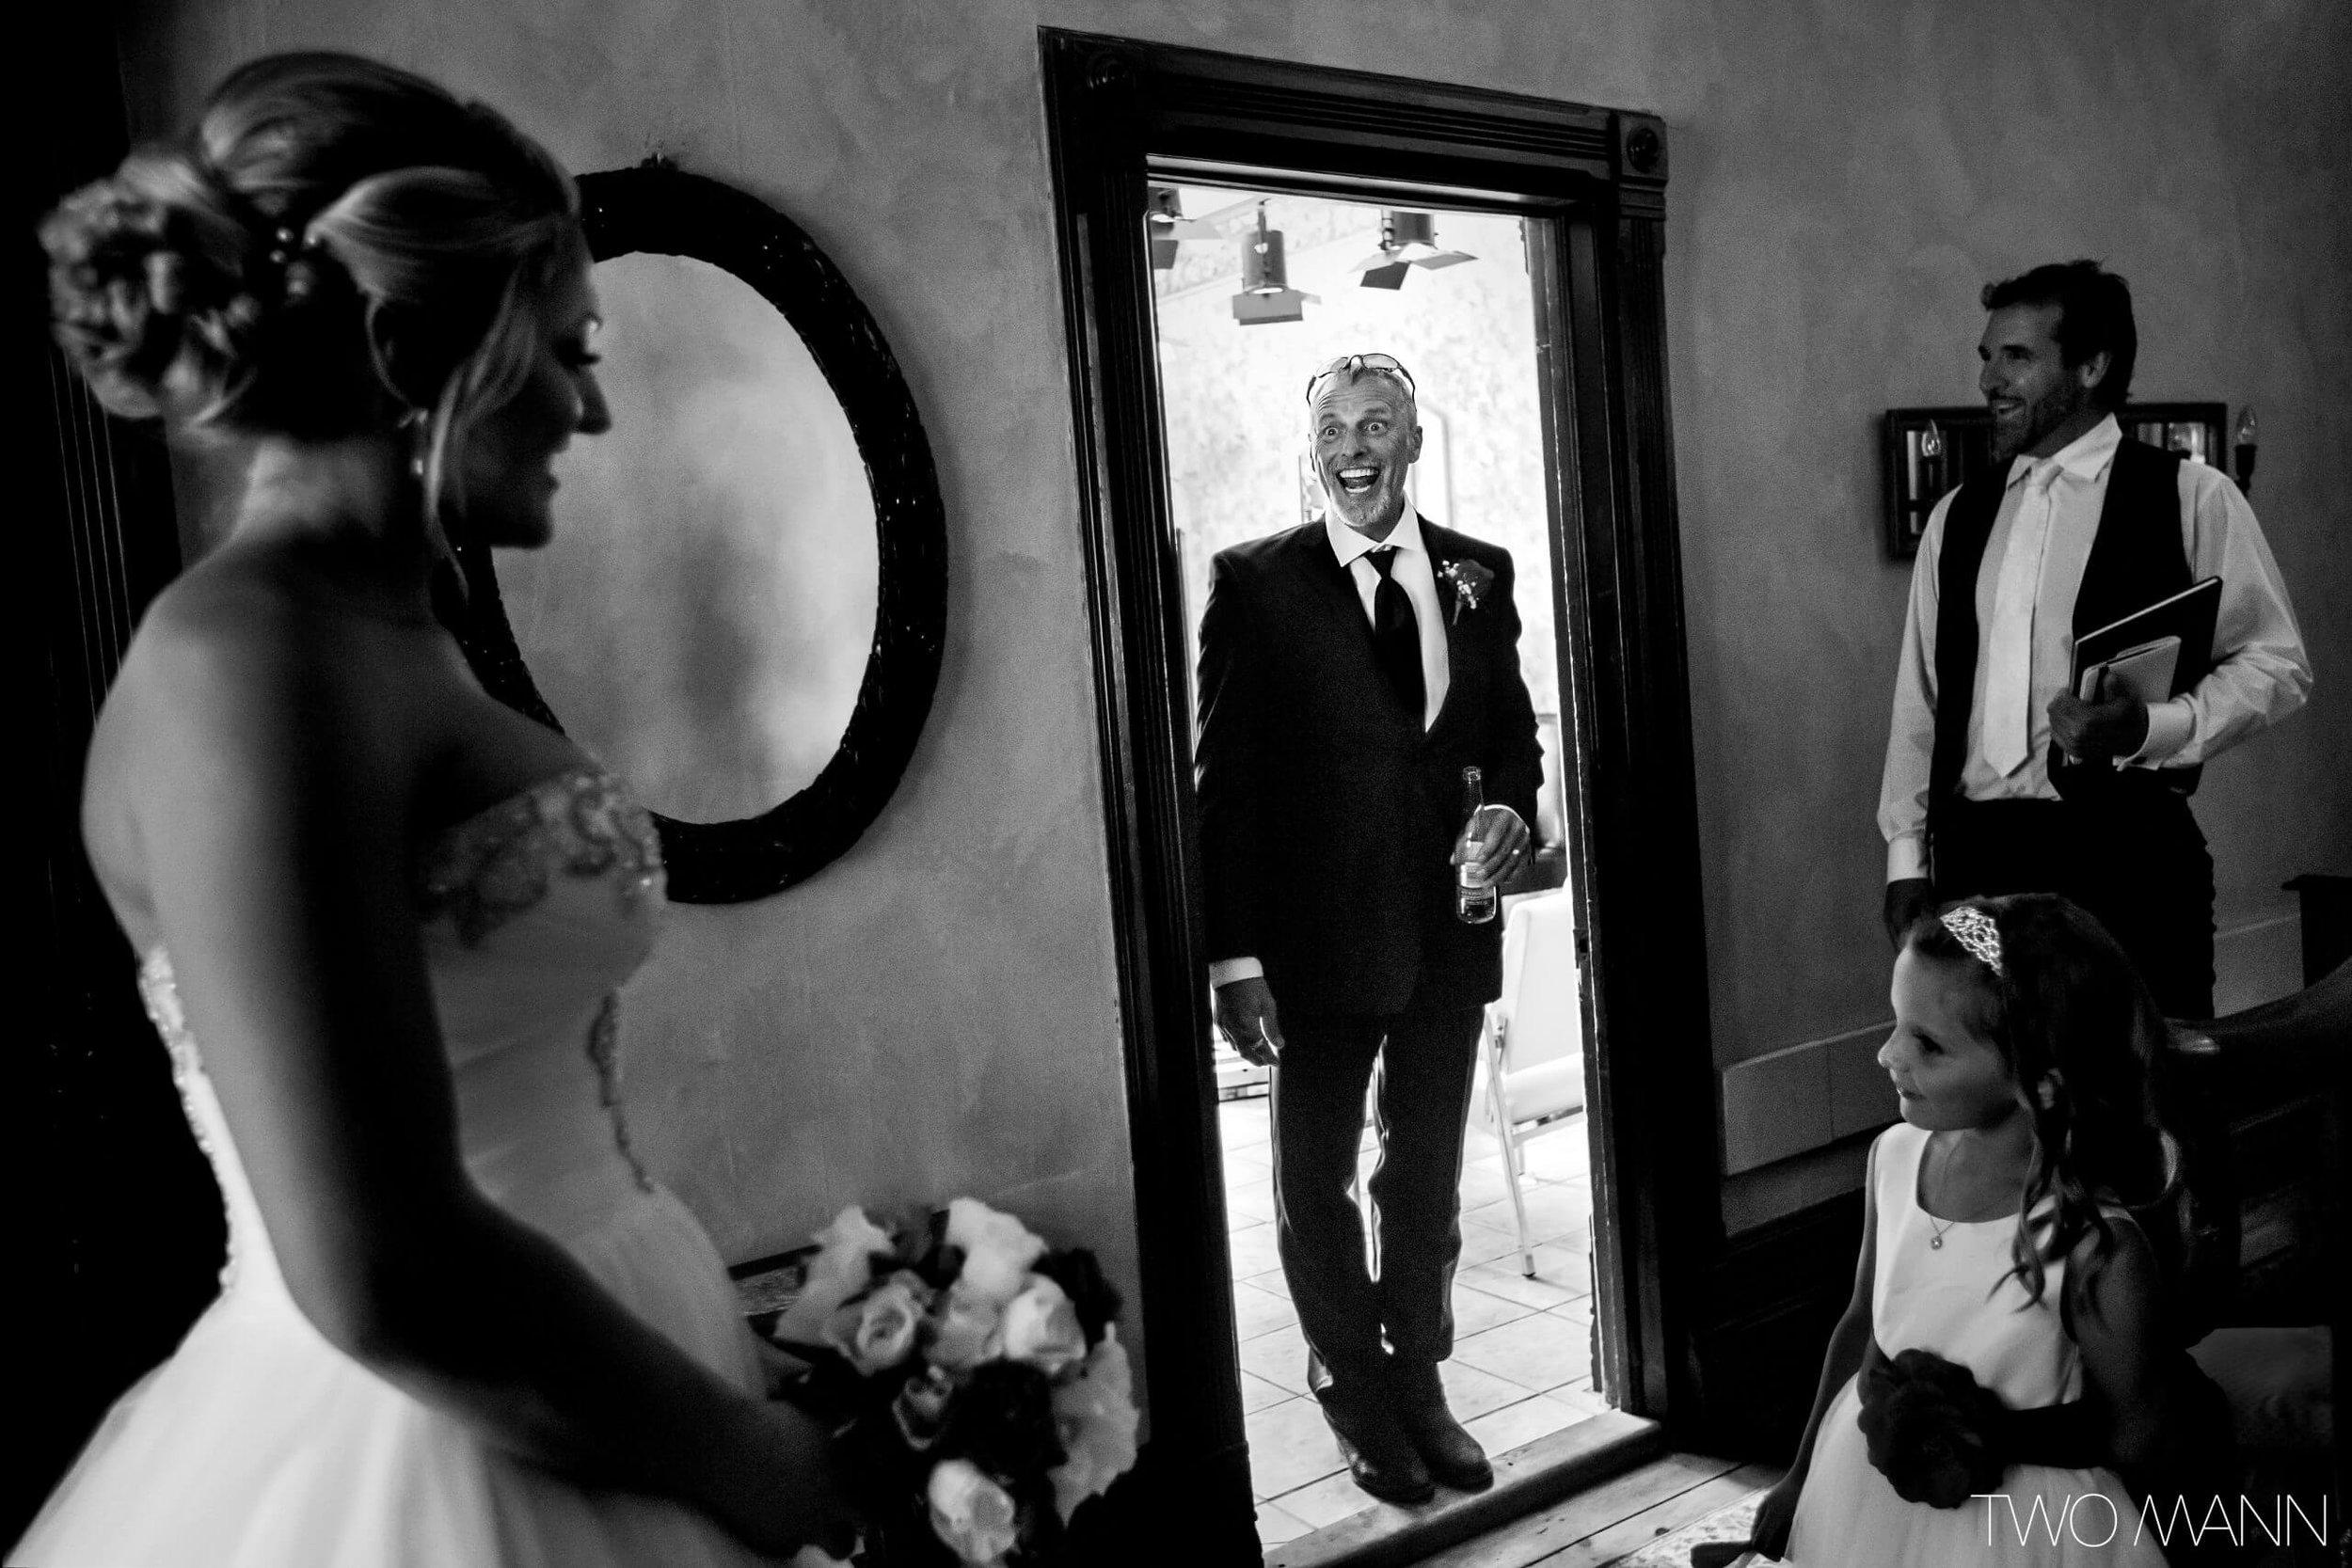 Two-Mann-Studios-Worlds-Best-Wedding-Photography-Best-of-2016-054-2560x1707.jpg